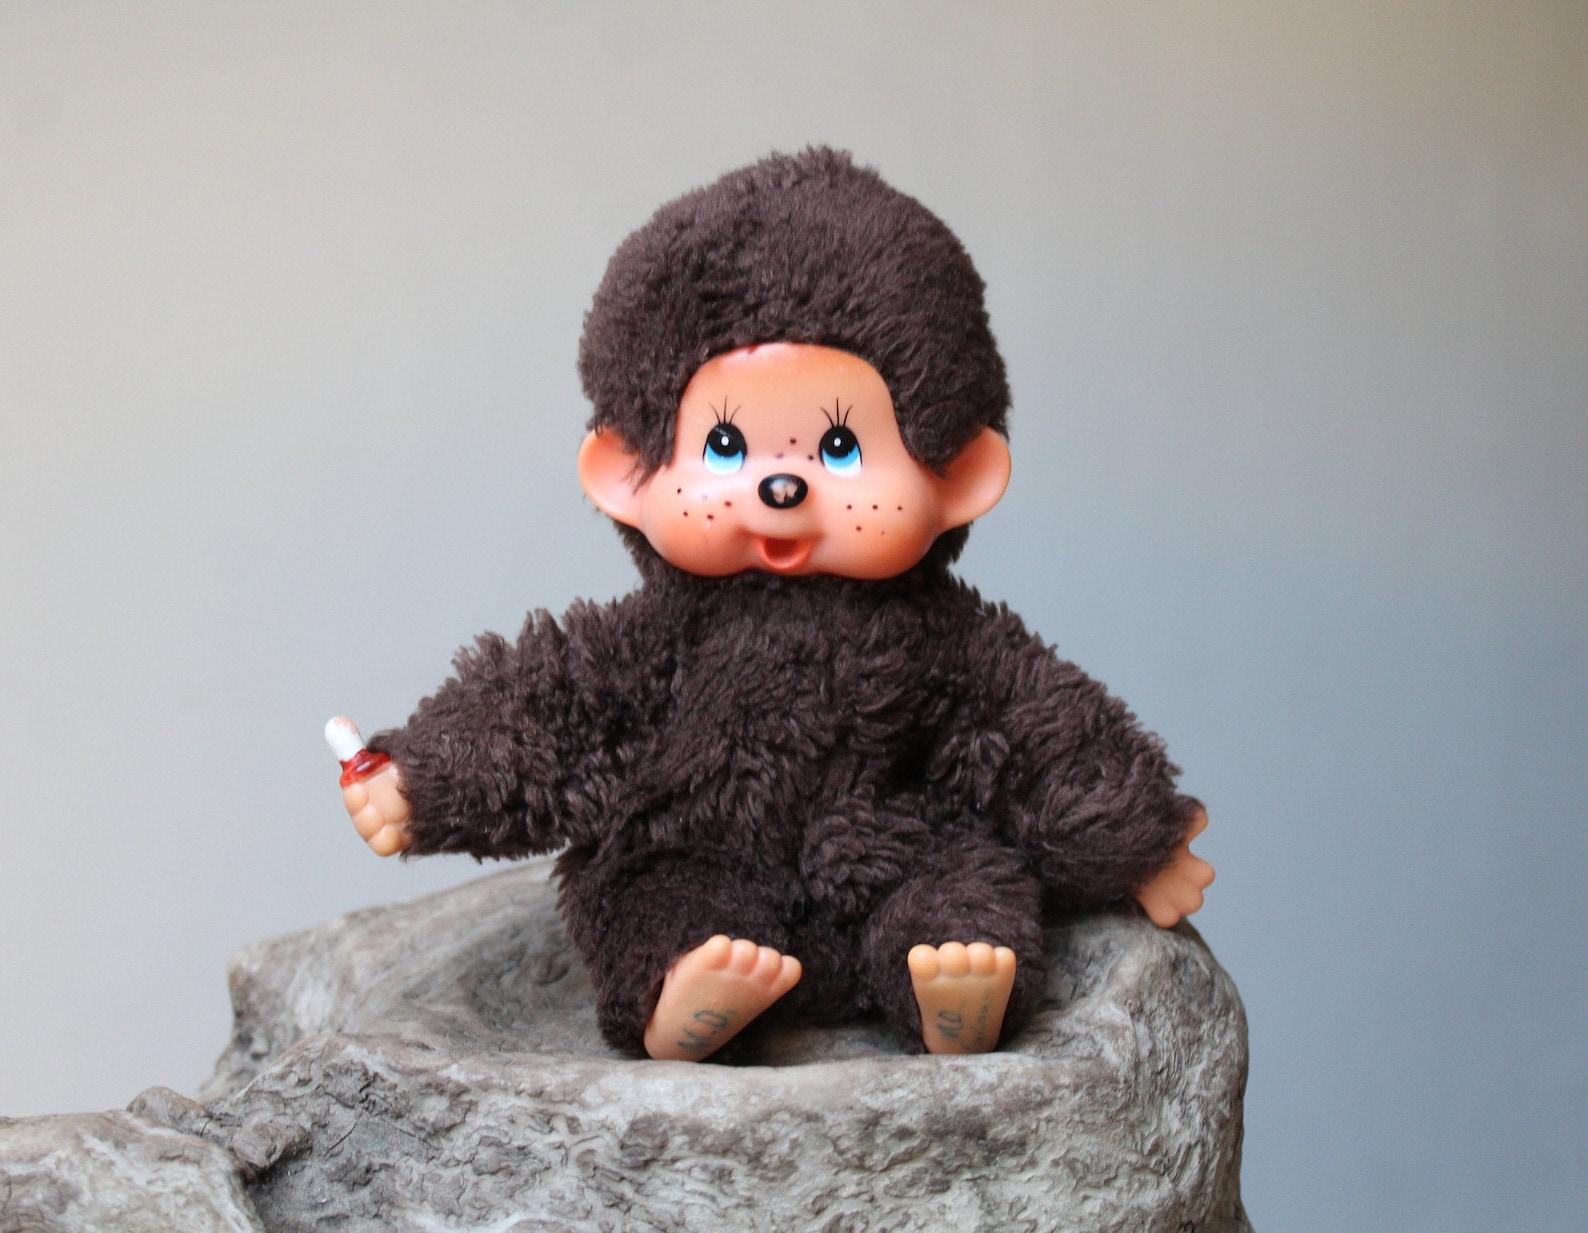 Collectible Vintage Monchhichi Doll Soft Toy Sekiguchi